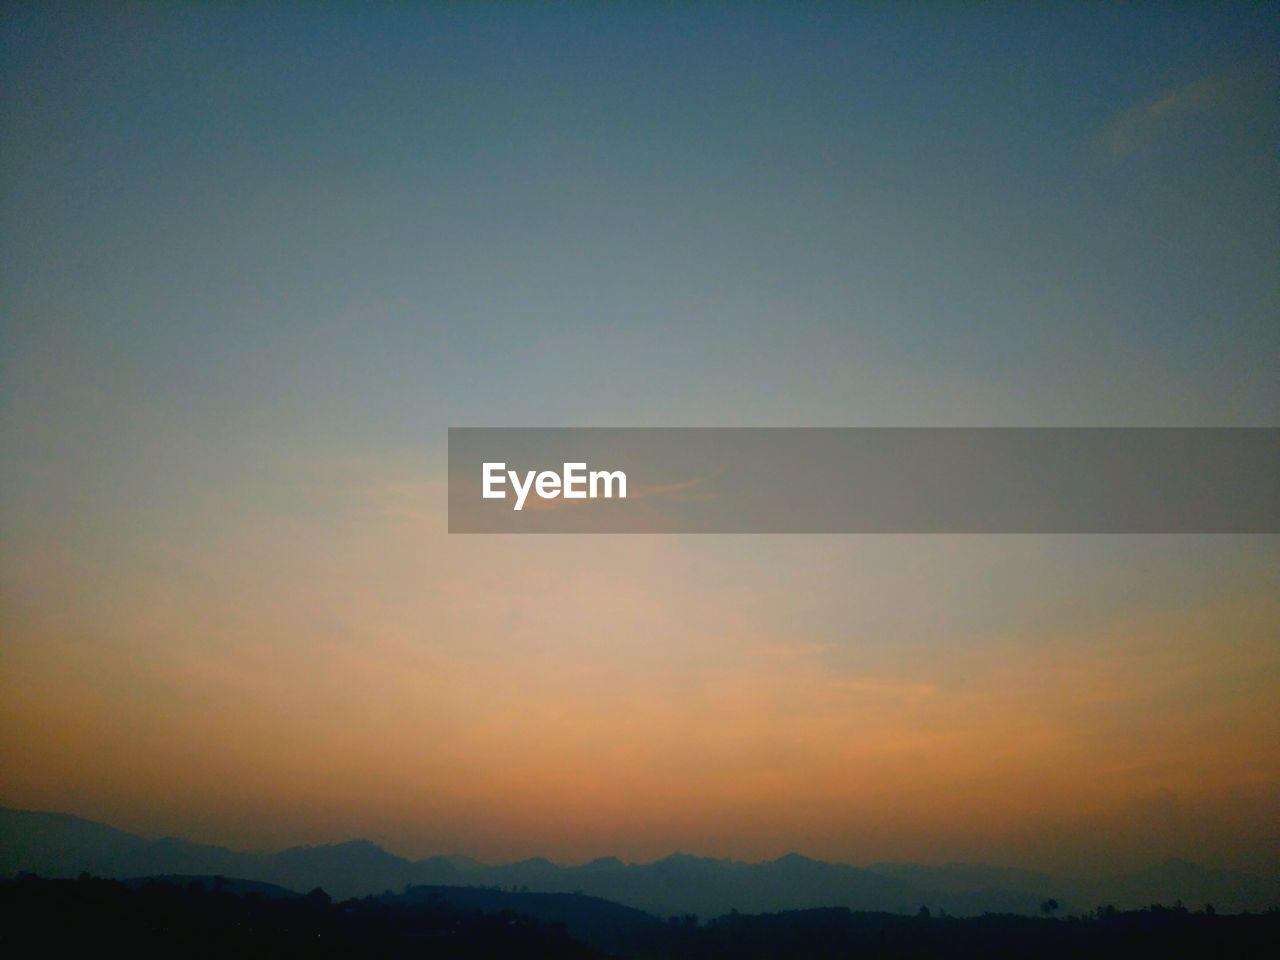 sky, sunset, beauty in nature, scenics - nature, tranquility, tranquil scene, cloud - sky, nature, no people, silhouette, idyllic, mountain, orange color, environment, sun, outdoors, landscape, copy space, sunlight, non-urban scene, romantic sky